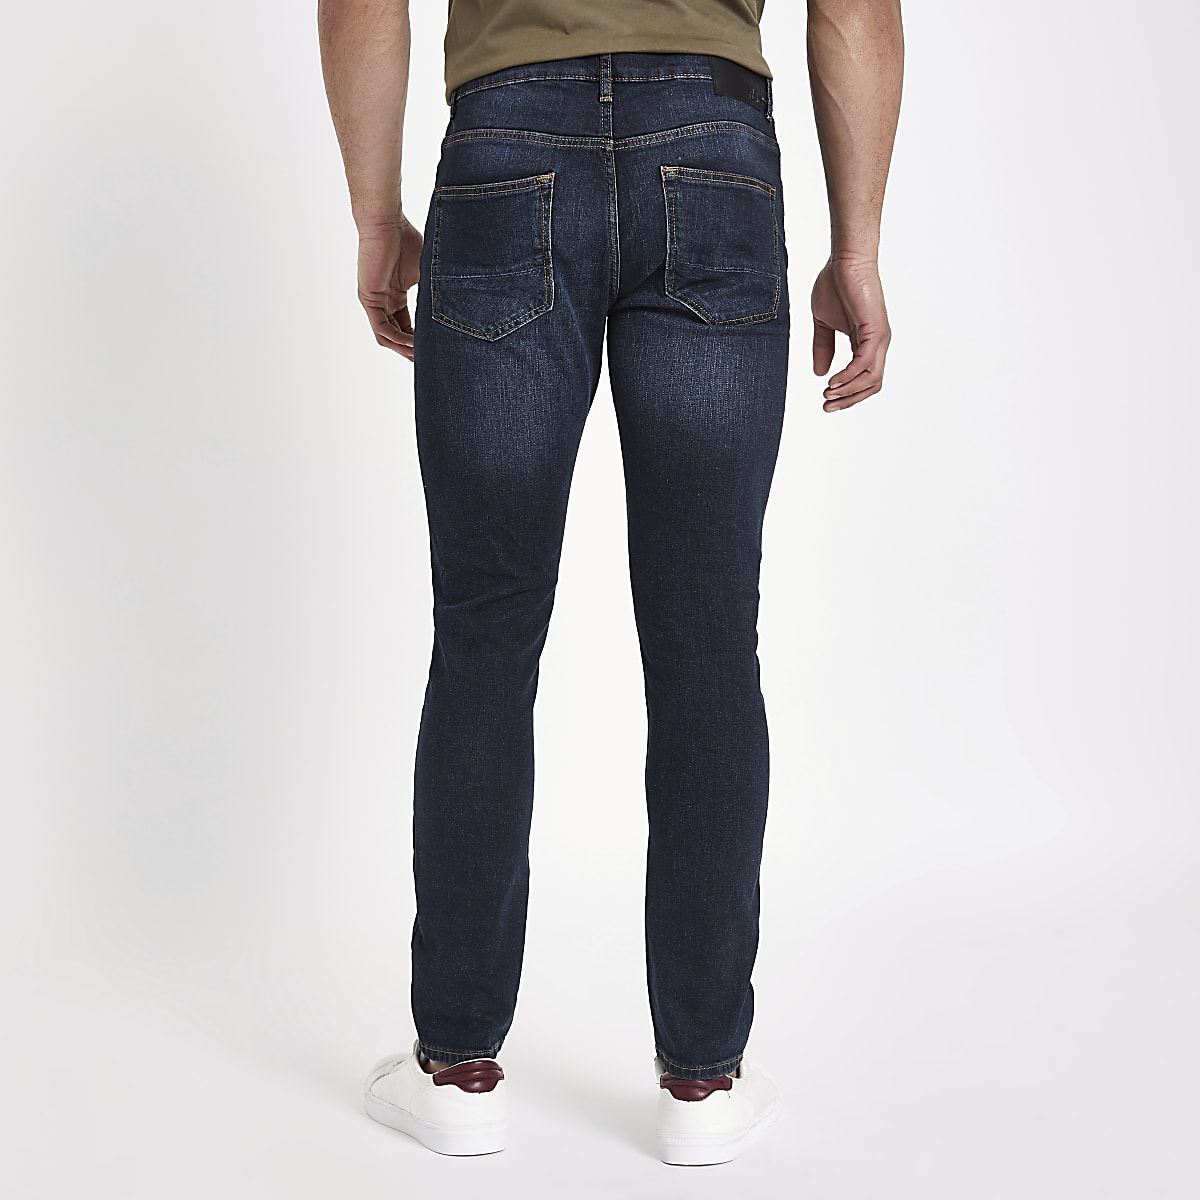 ae762a0c85 Dark blue fade Sid skinny jeans - Skinny Jeans - Jeans - men